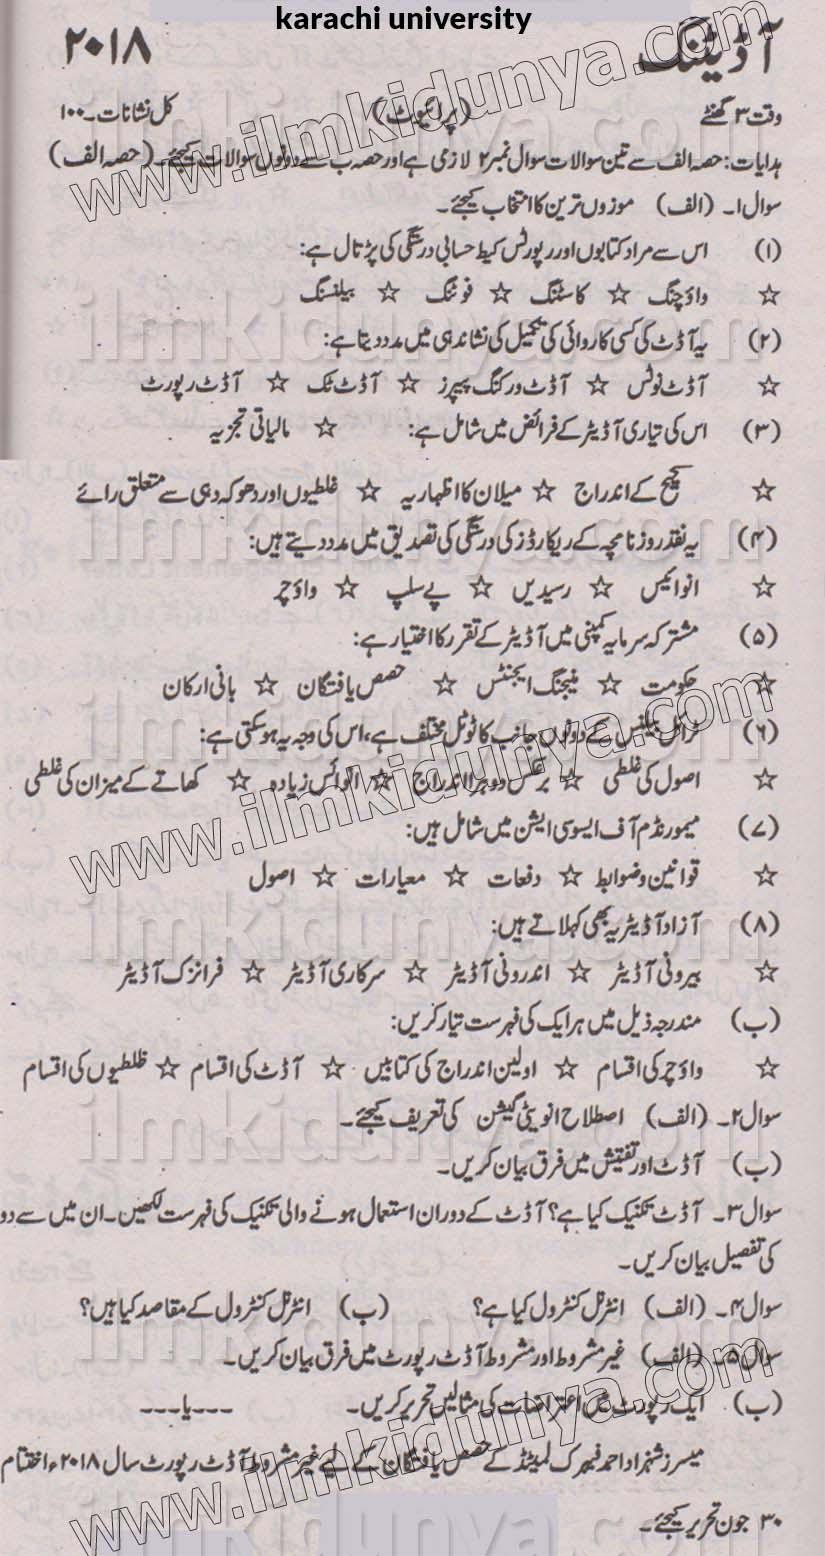 past paper 2018 karachi university b.com part 2 auditing